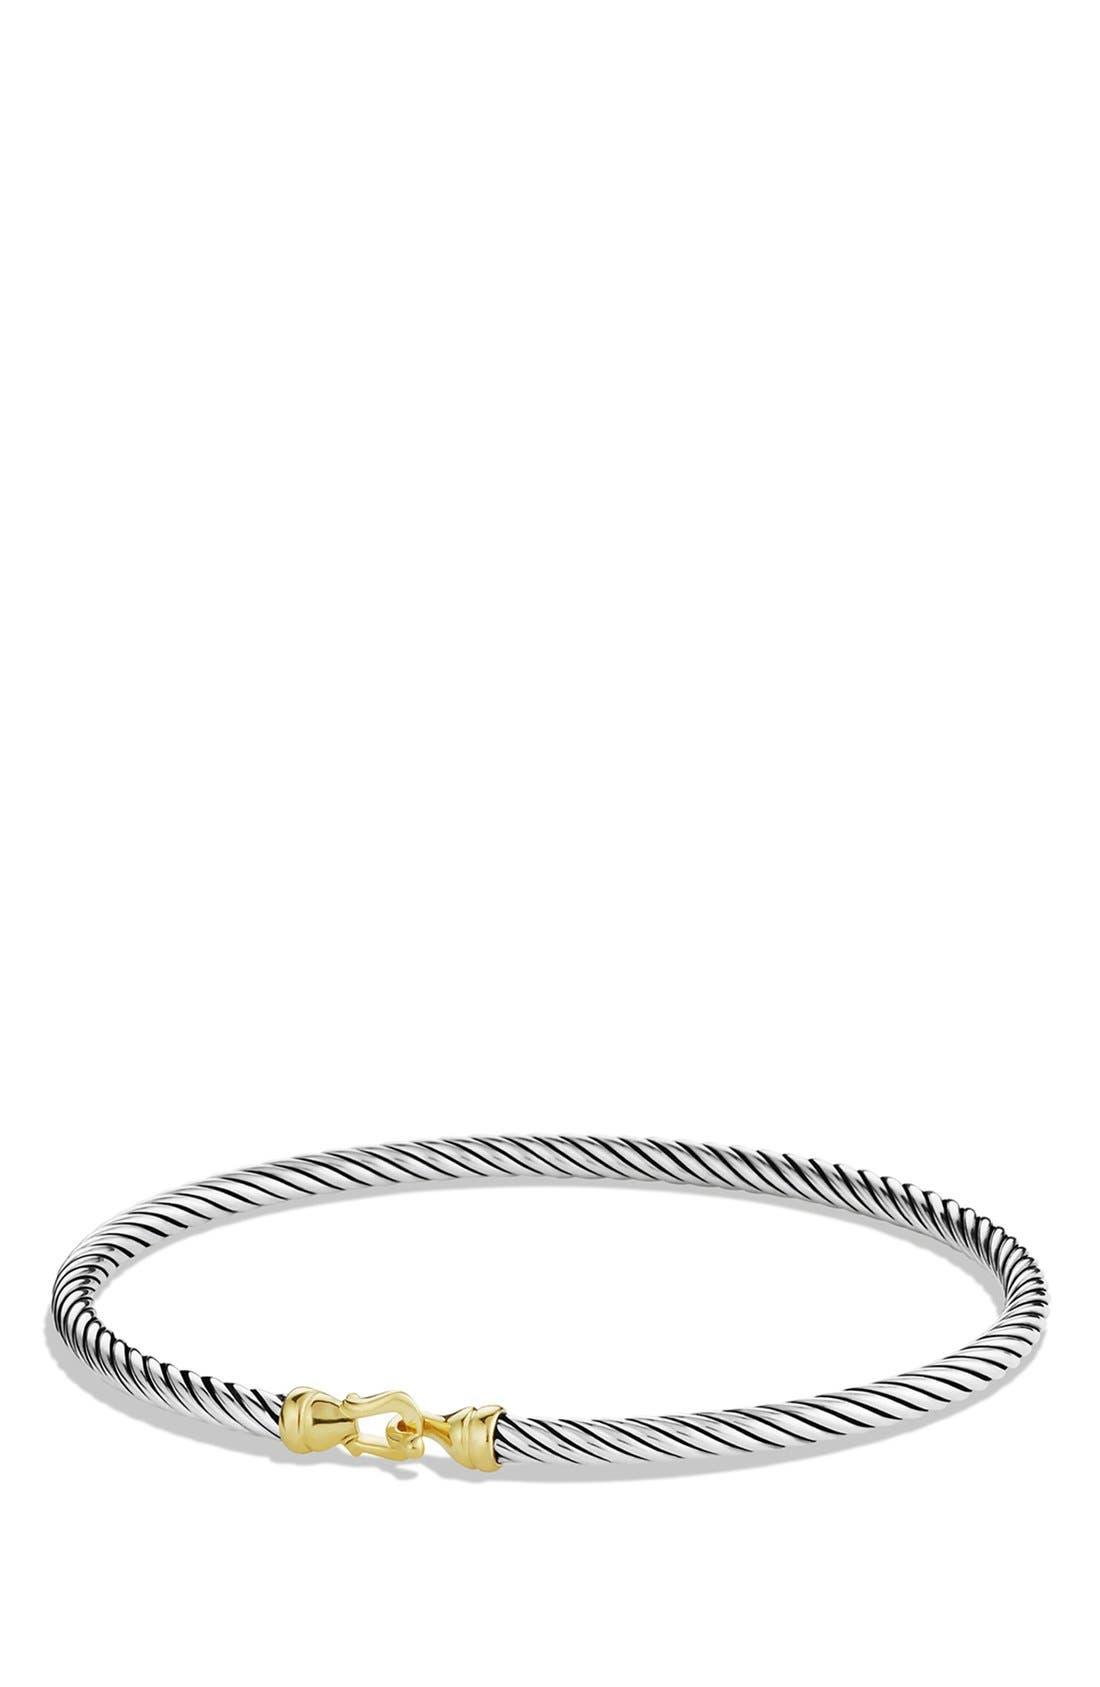 David Yurman 'Cable Buckle' Two-Tone Bracelet